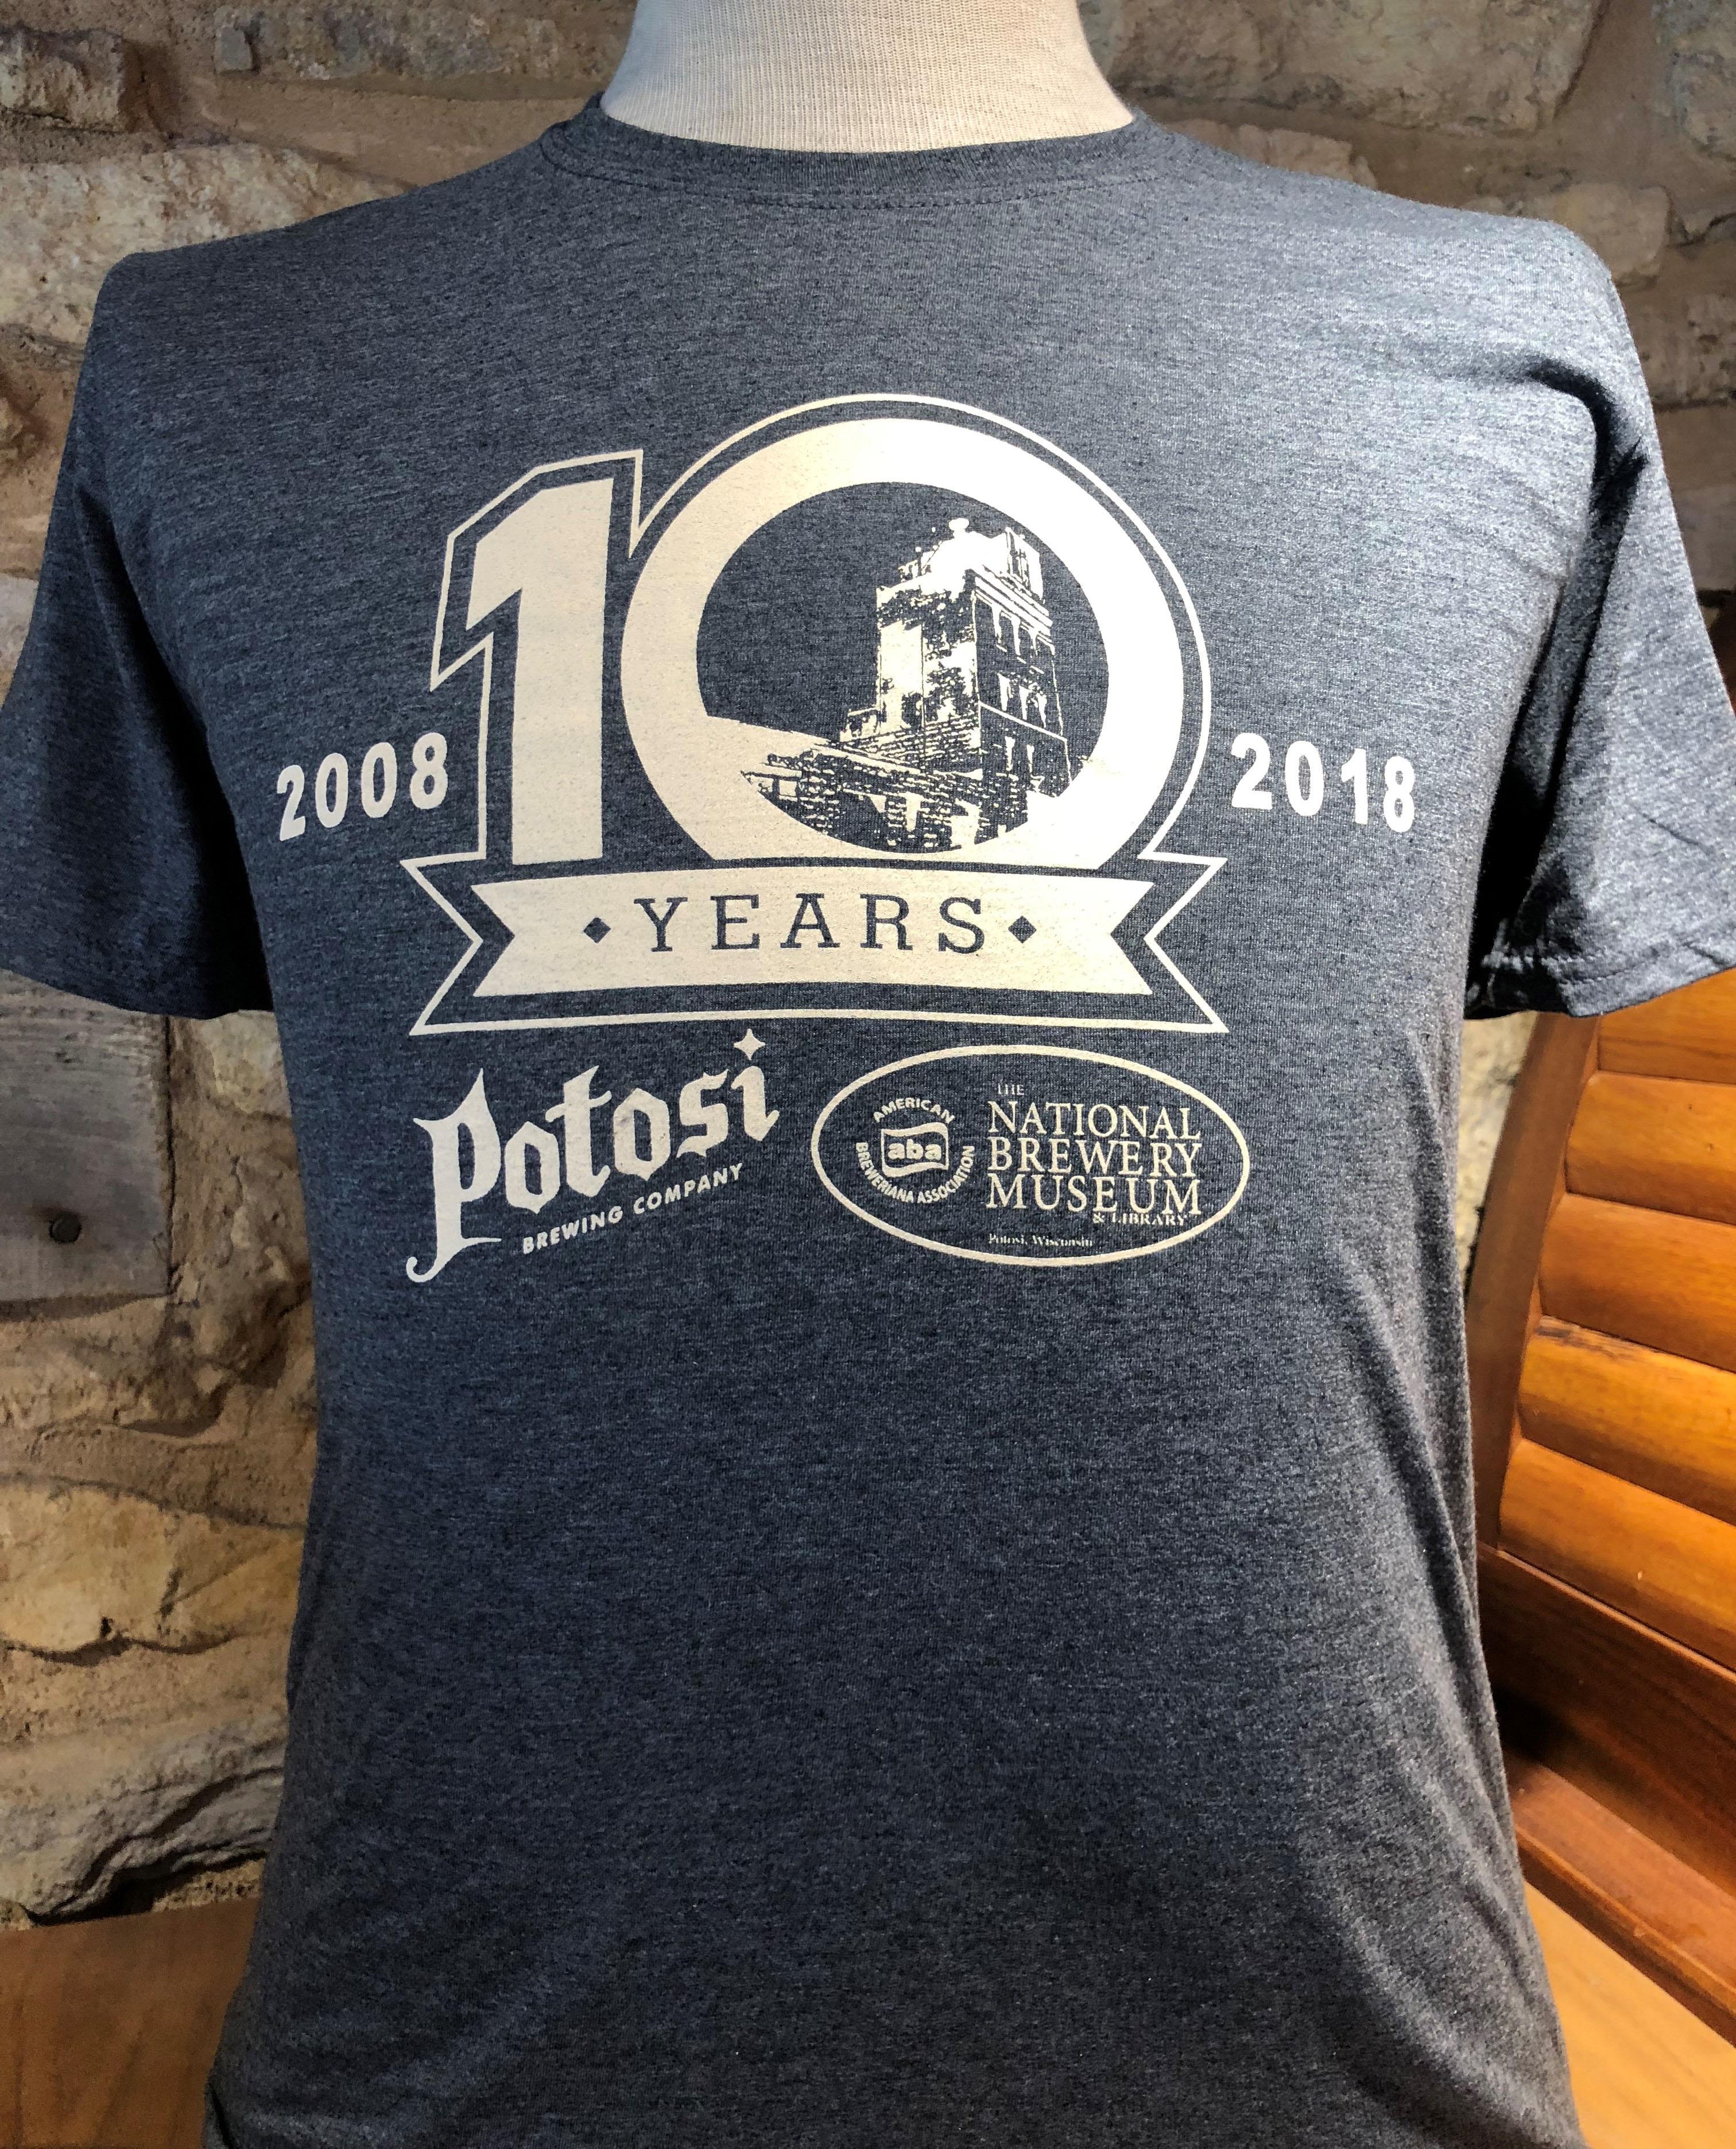 10 Year Anniversary Tee Potosi Brewing Company